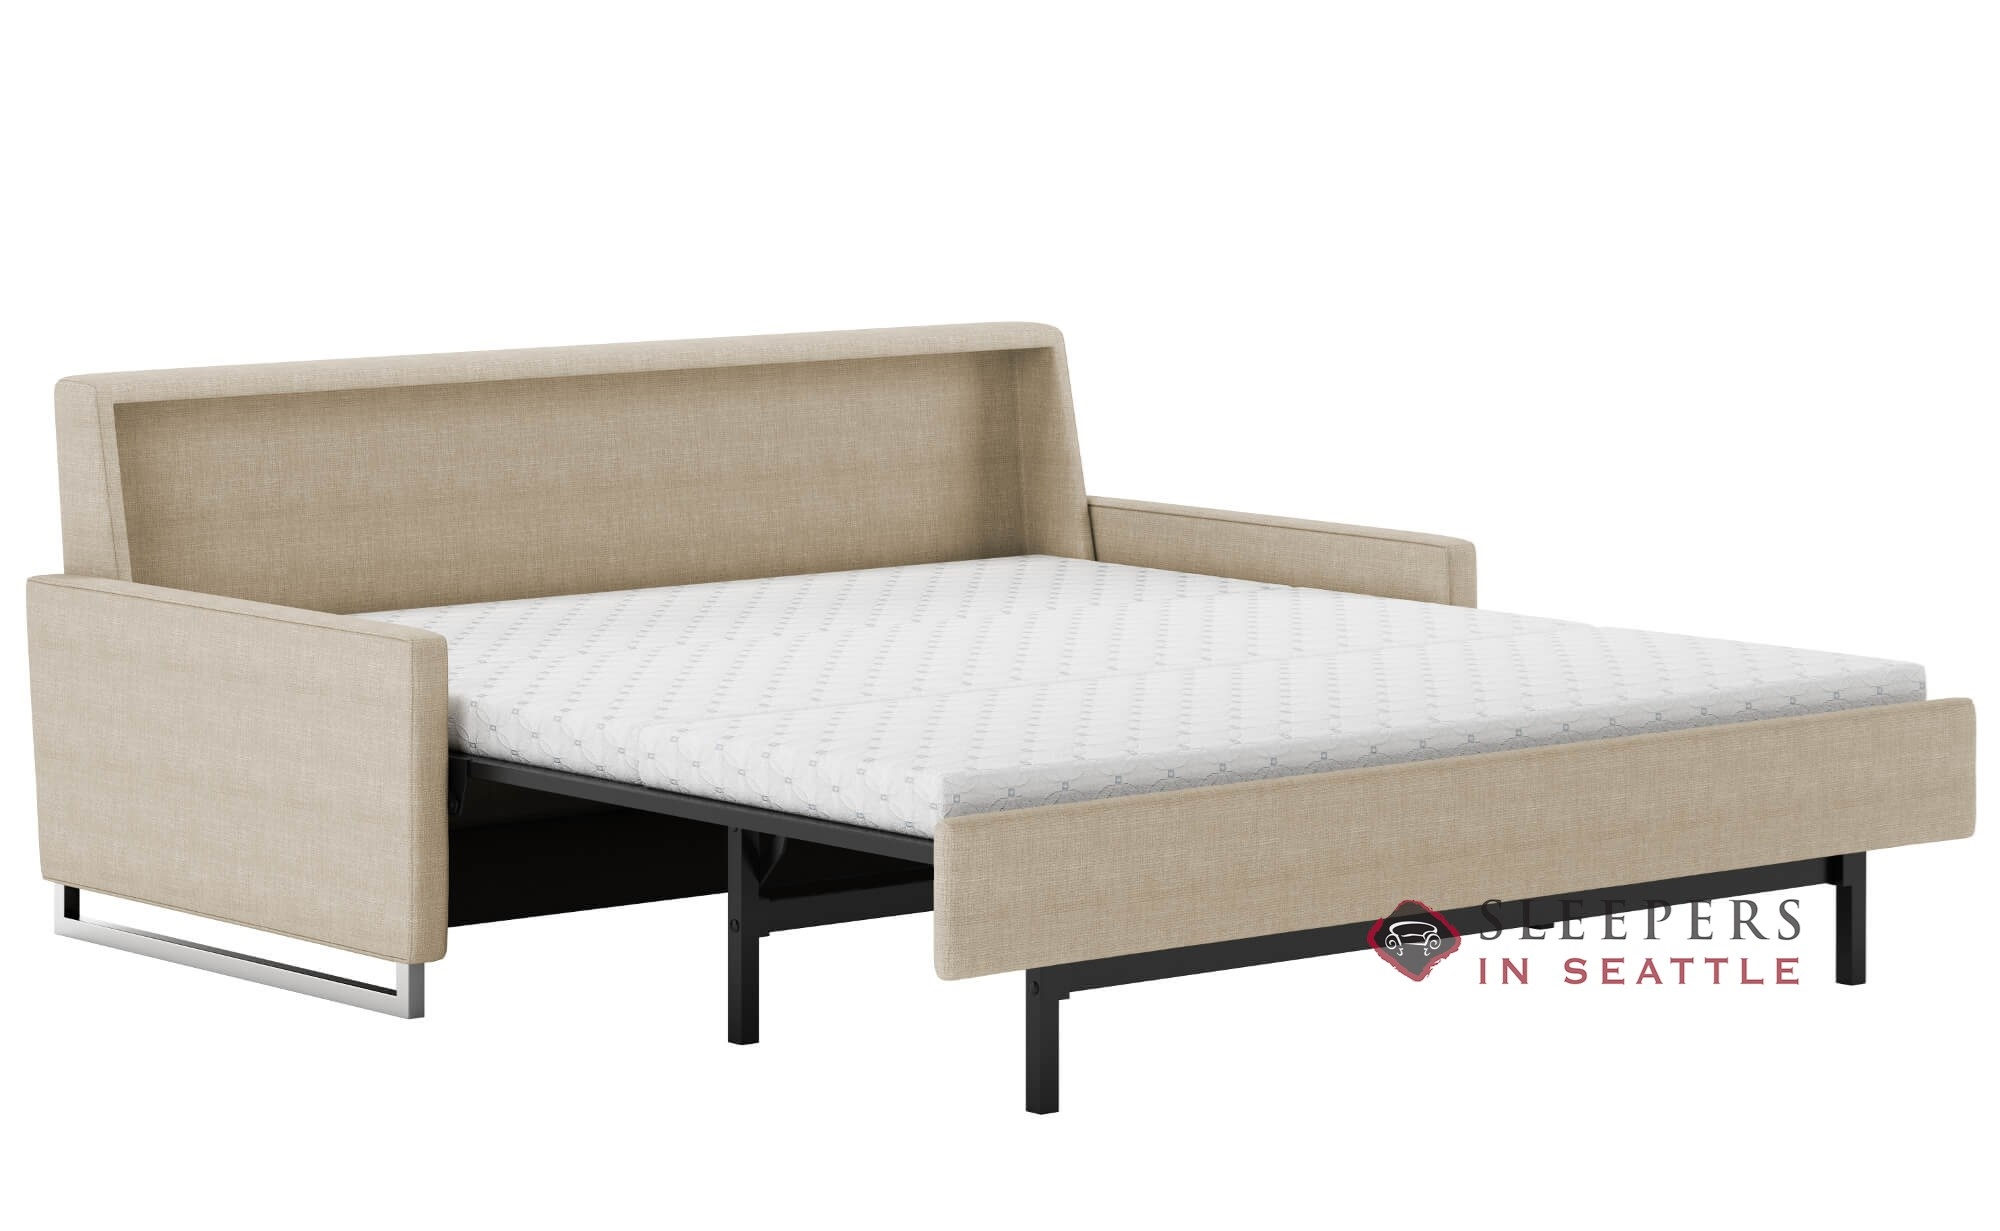 bedcomfort leatherr sofa air comfort sofas bed cloud pet sale american the comforter leather mattress design pics sleeper